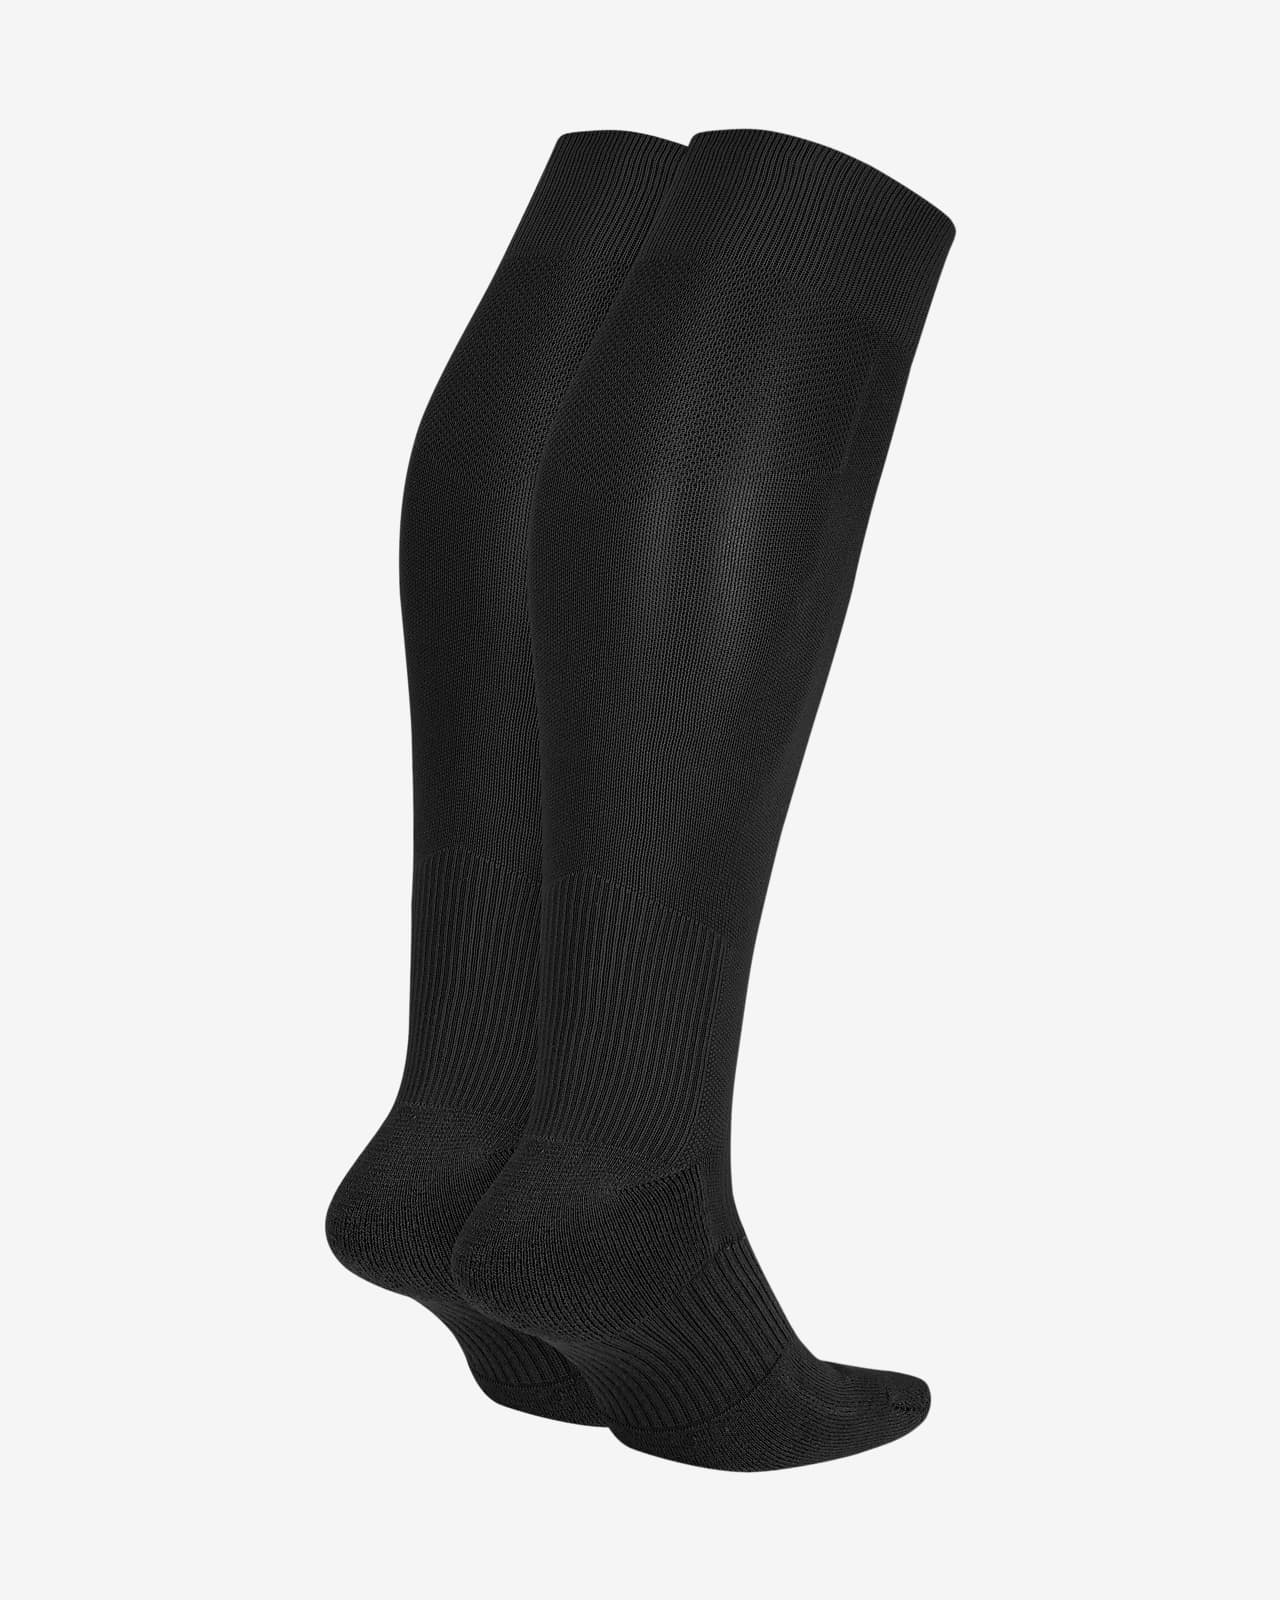 Calcetines de f/útbol para ni/ños 4 a 16 a/ños Laulax Coolmax Performance